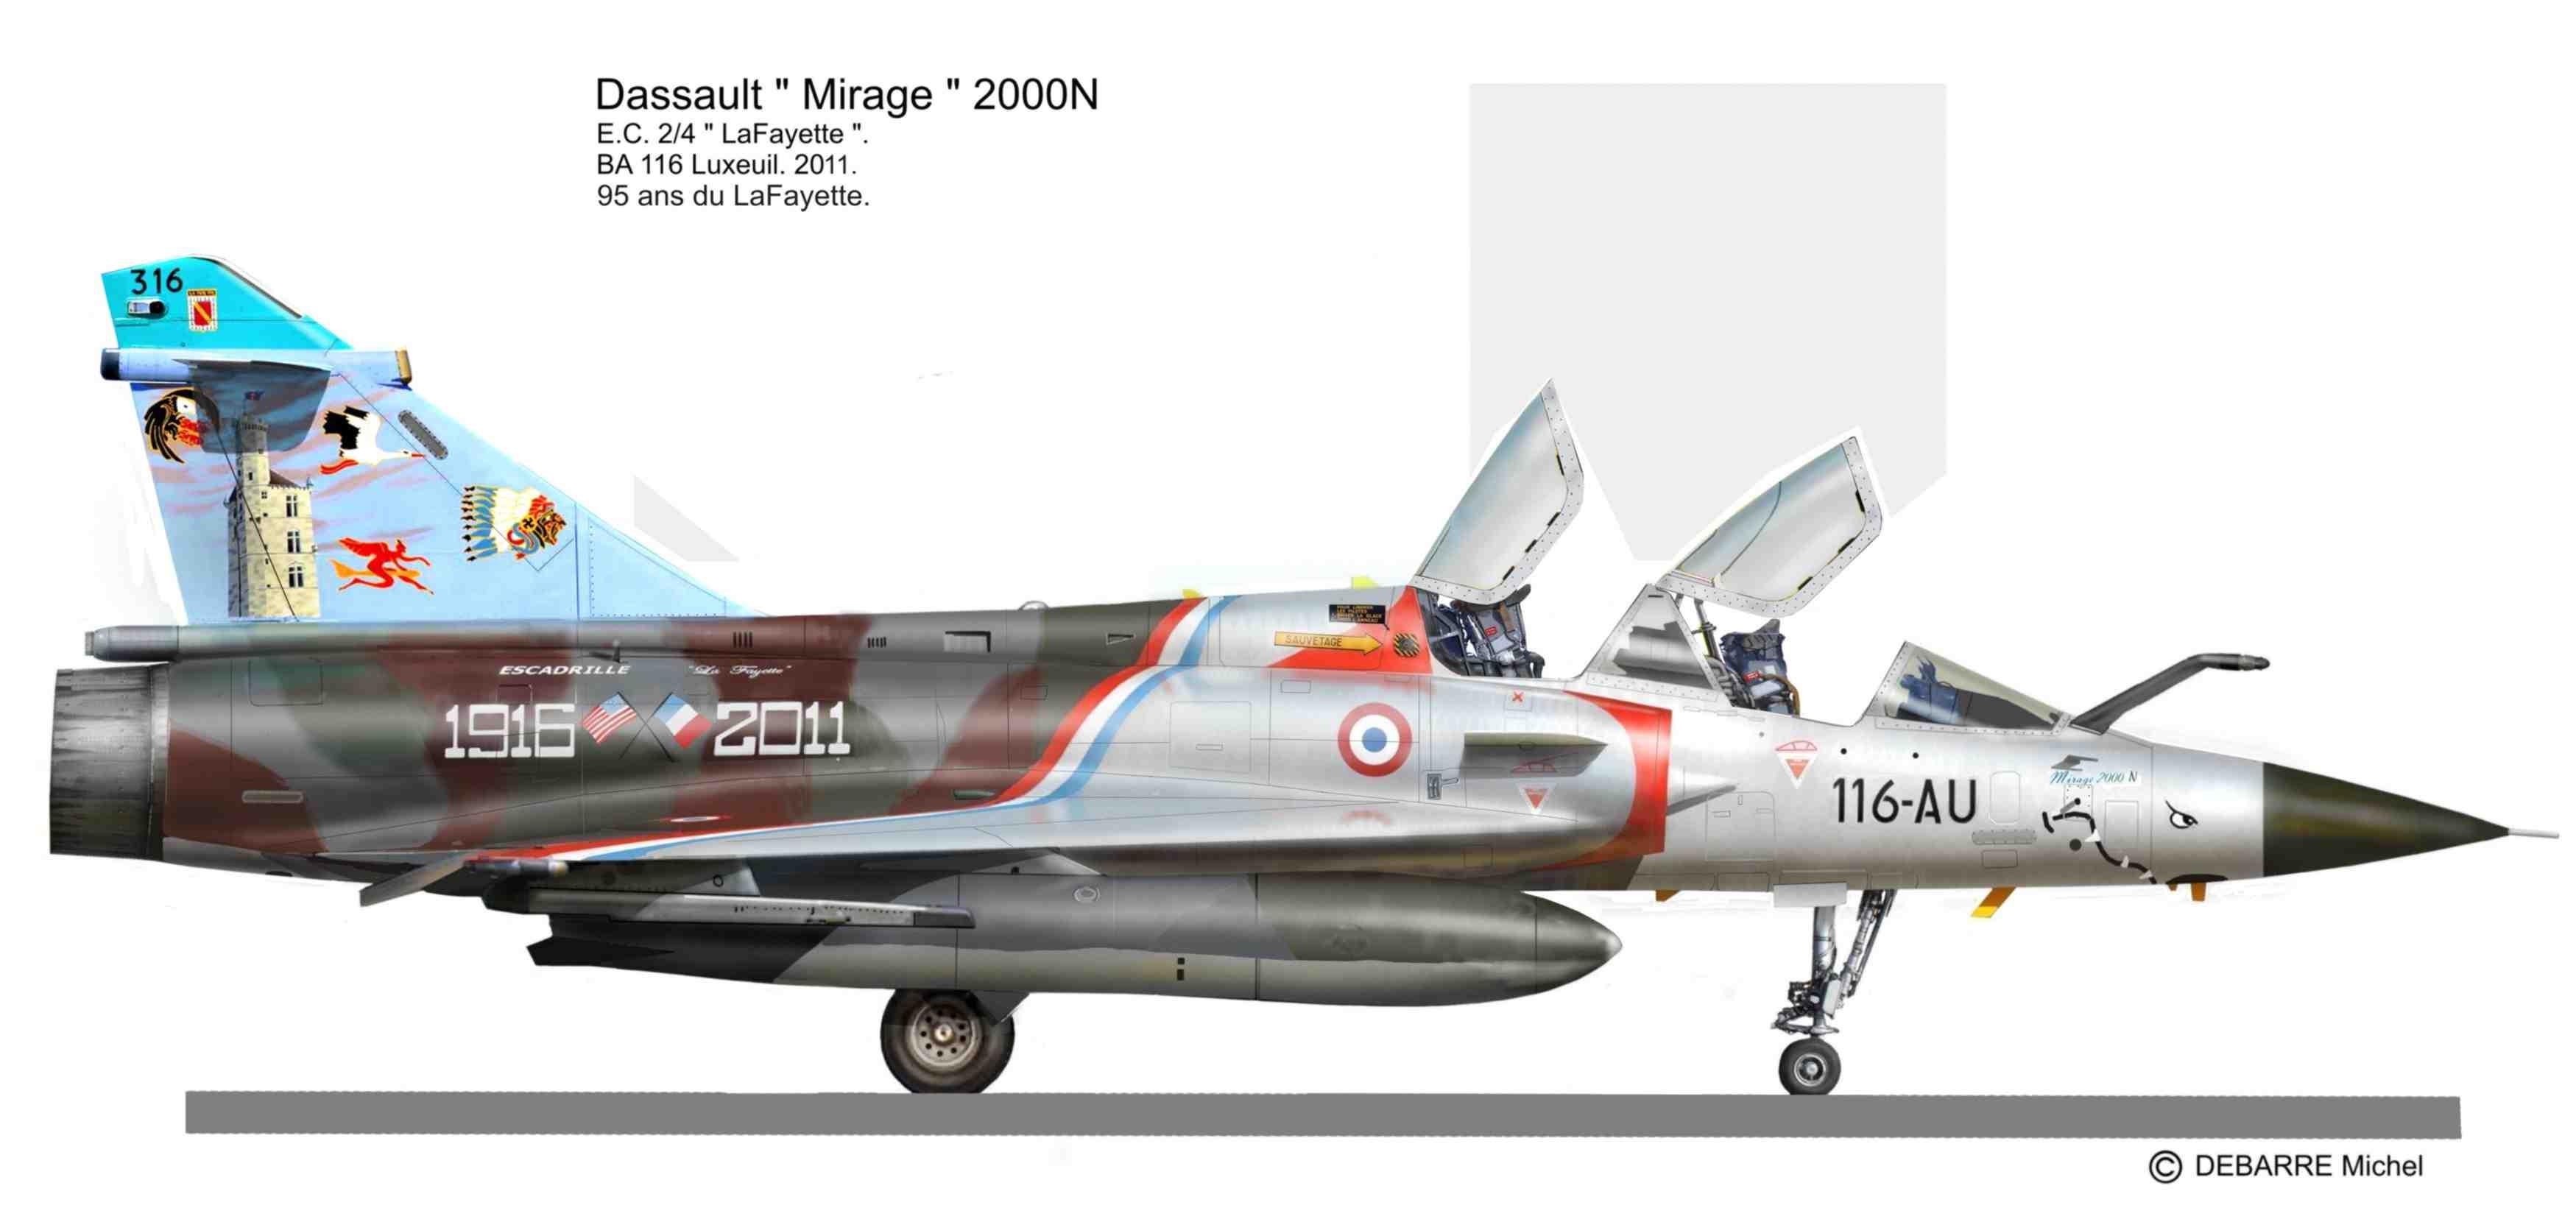 Mirage 2000 c t droit miprofiles for Interieur mirage 2000